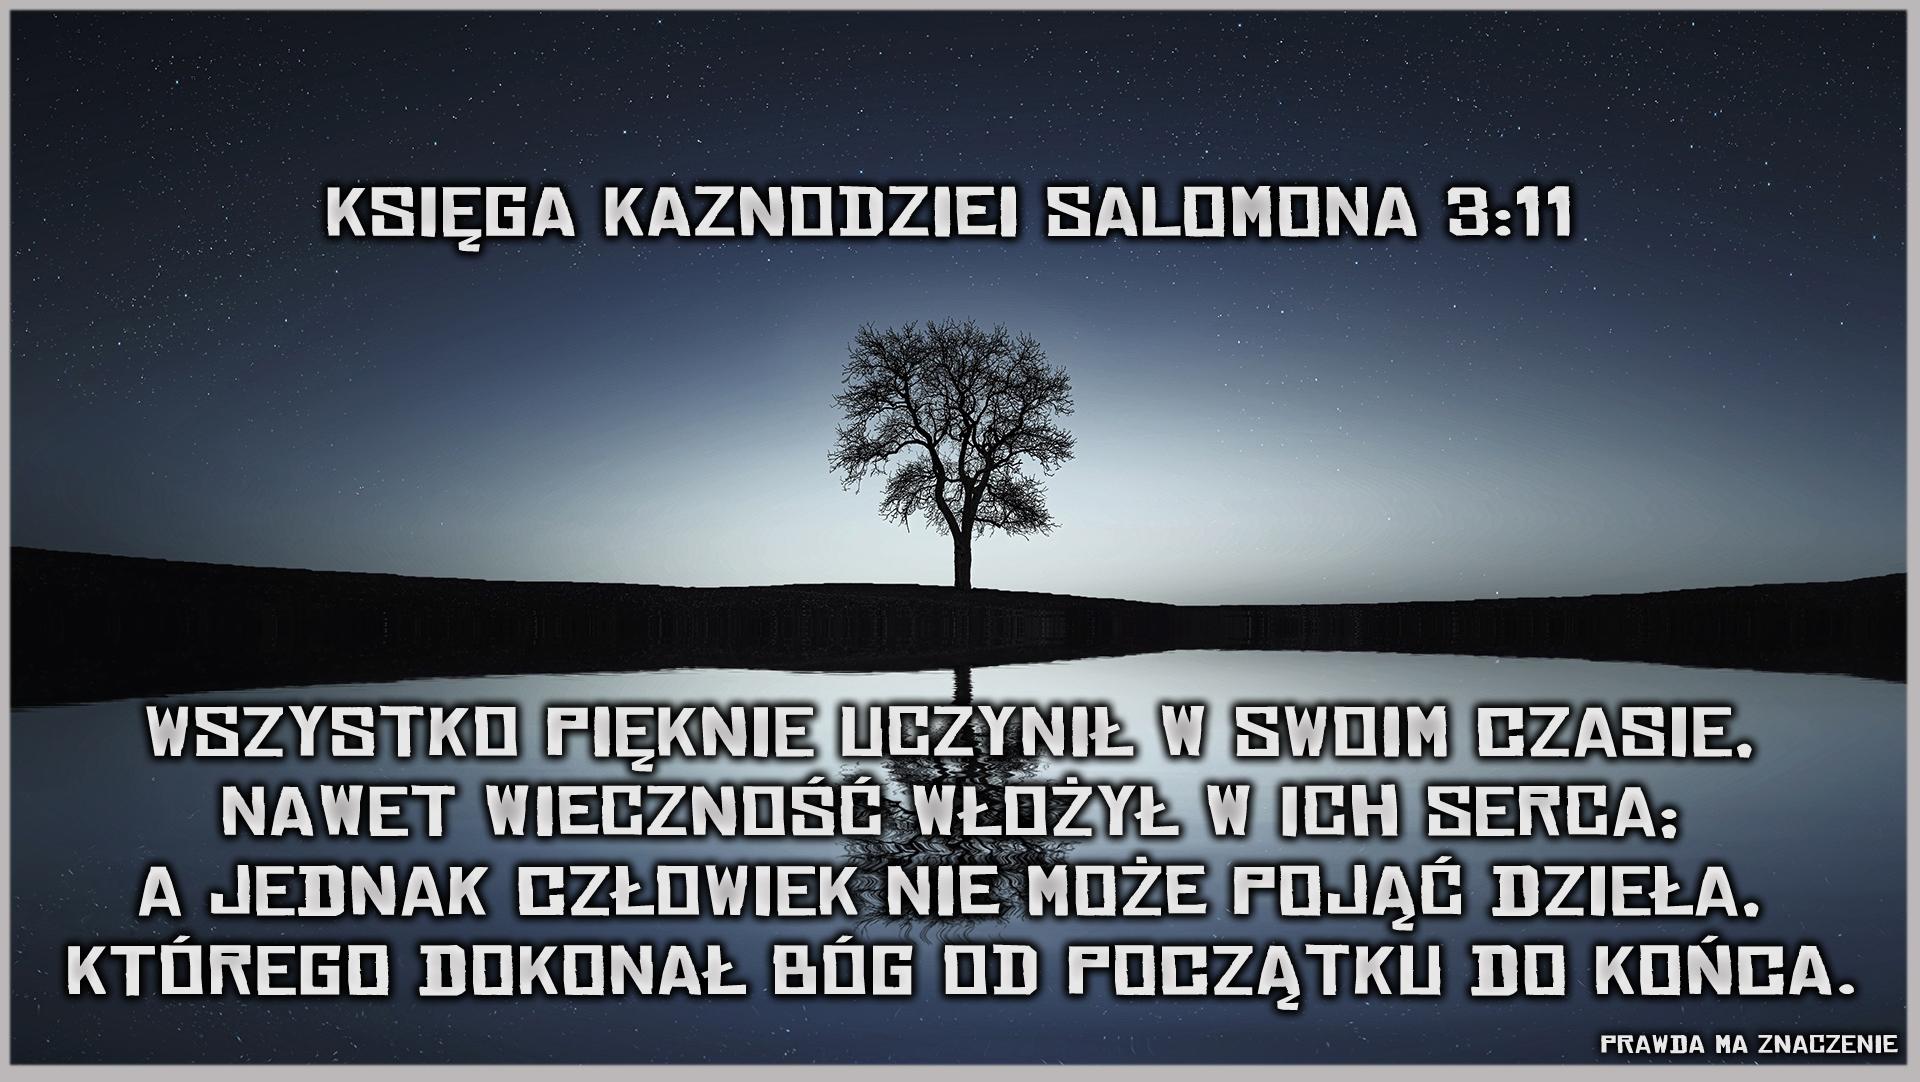 kaz salomona 3 11